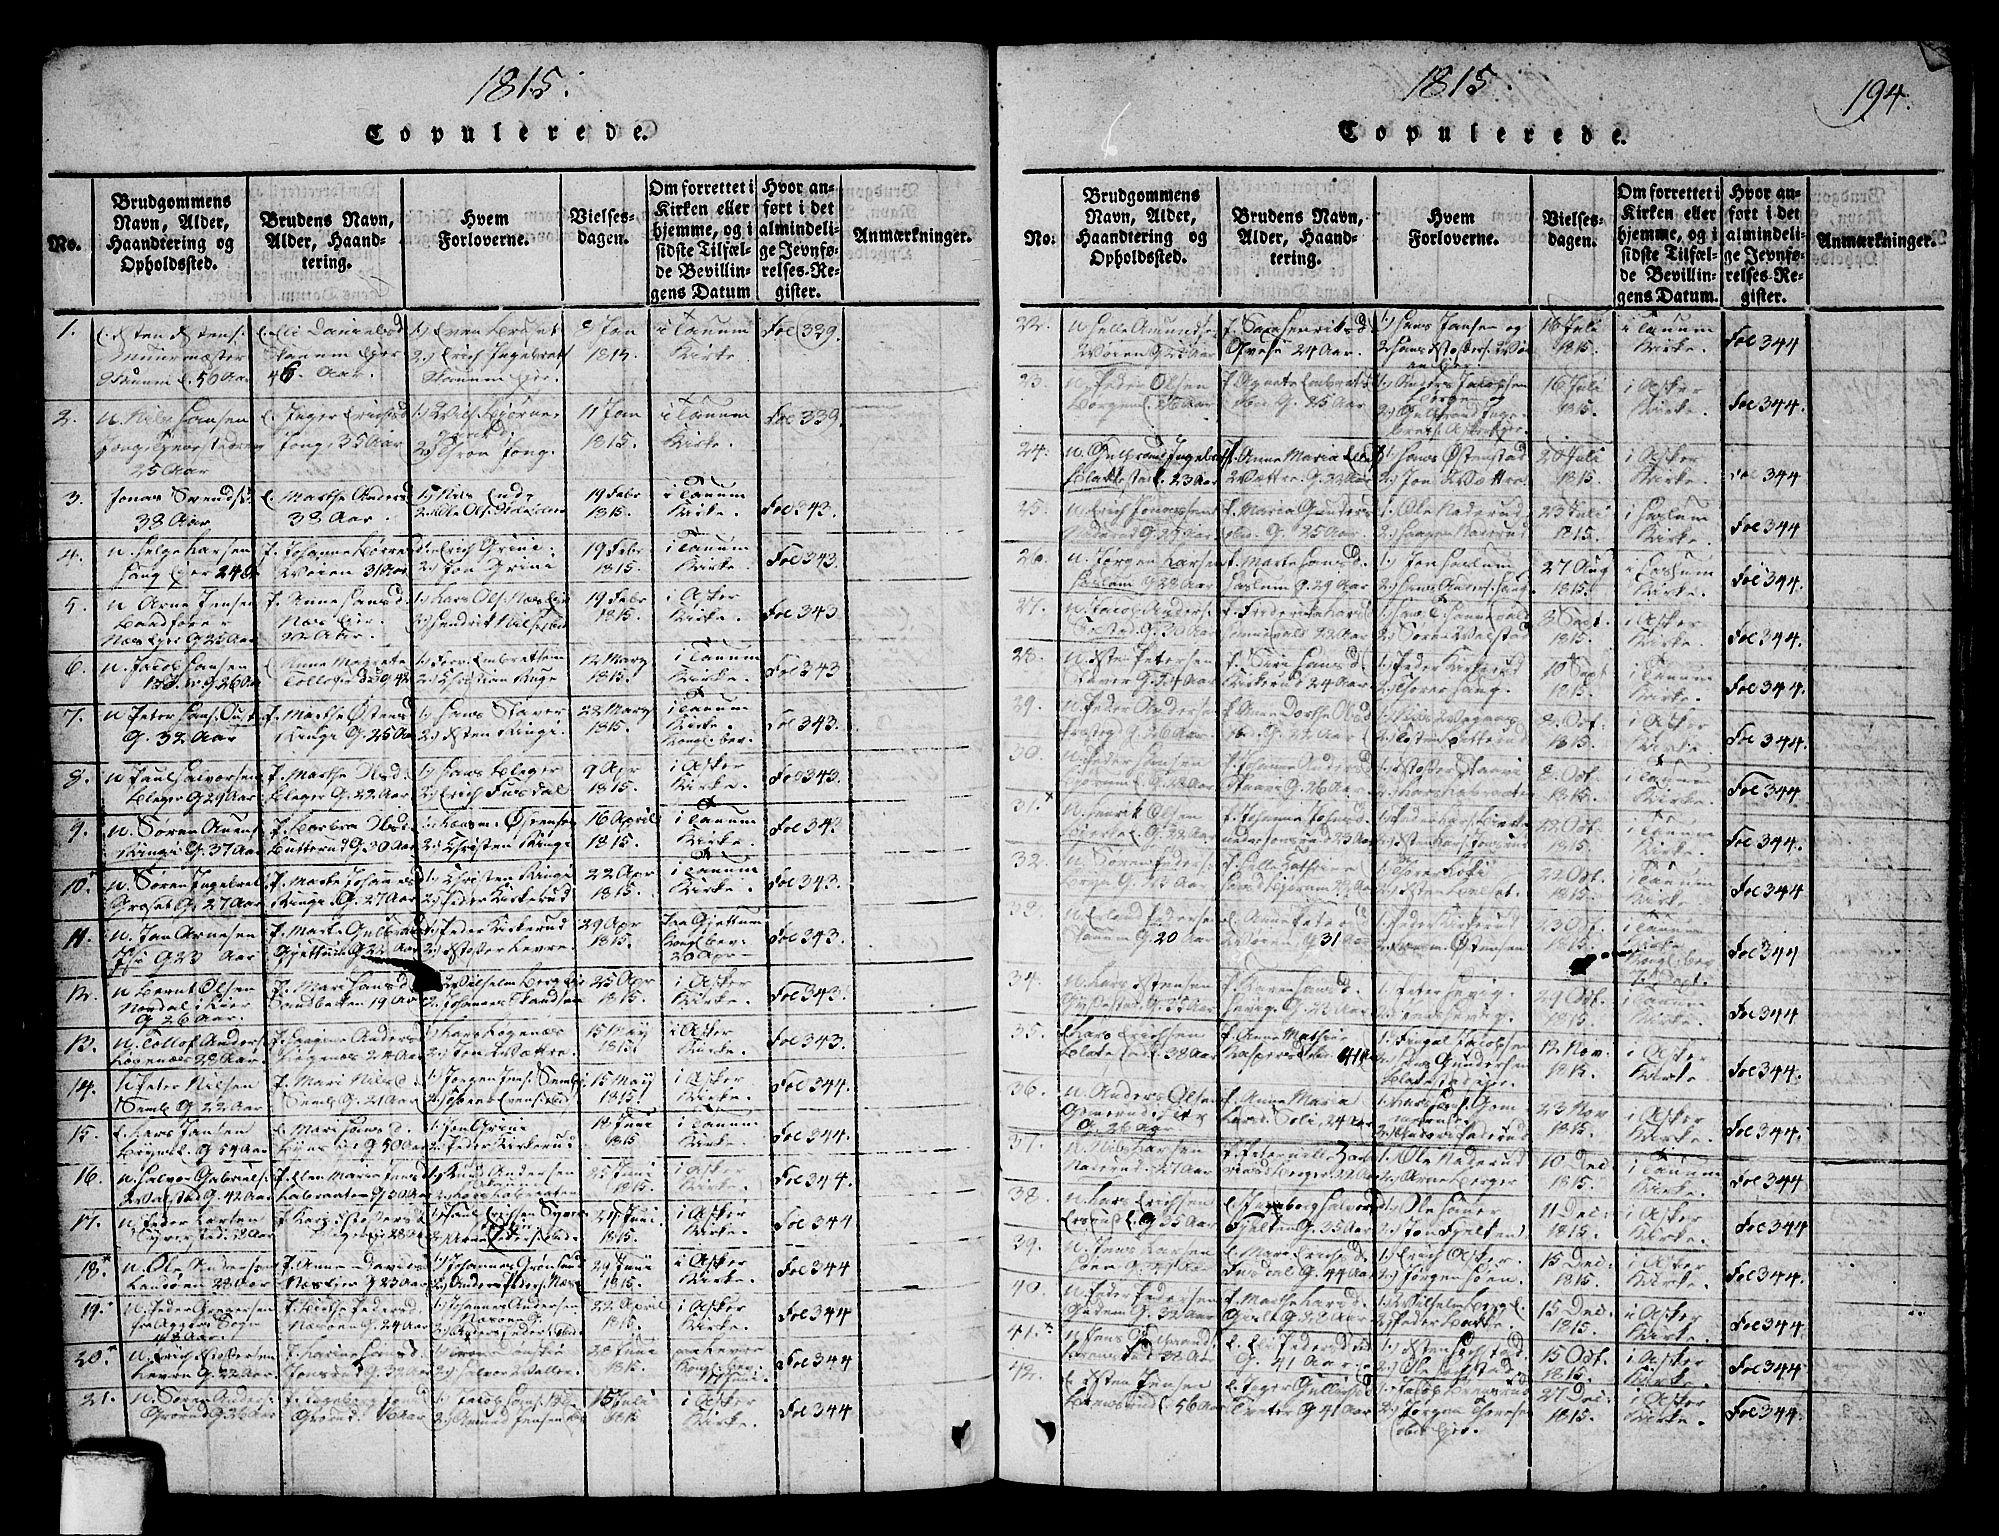 SAO, Asker prestekontor Kirkebøker, G/Ga/L0001: Klokkerbok nr. I 1, 1814-1830, s. 194